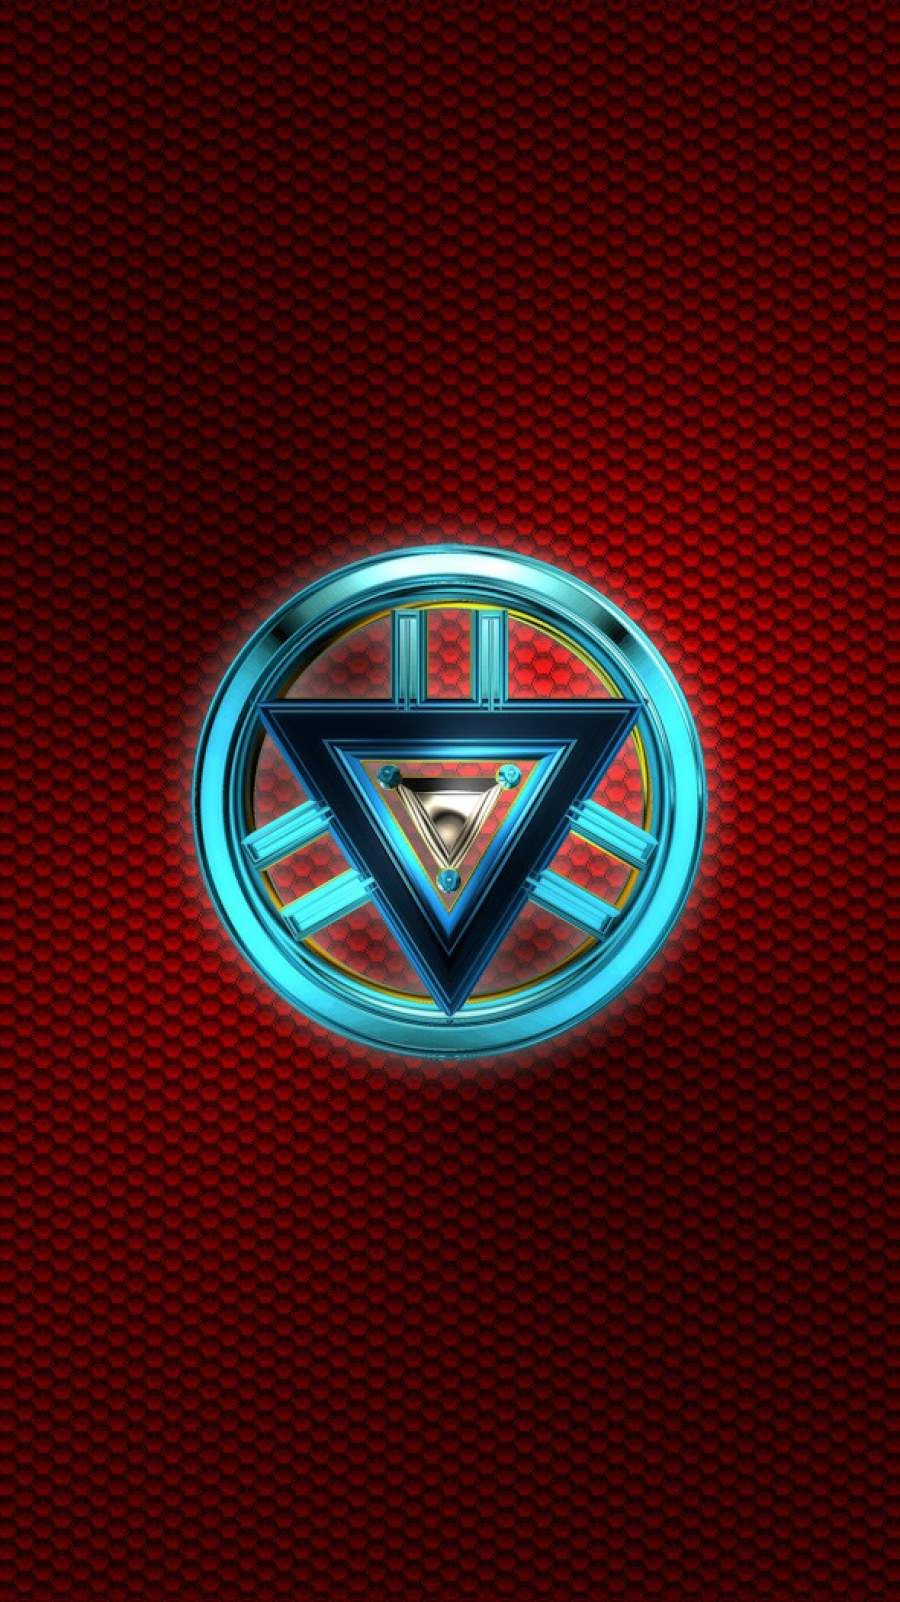 The New Element Arc Reactor Iron Man Iphone Wallpaper Iron Man